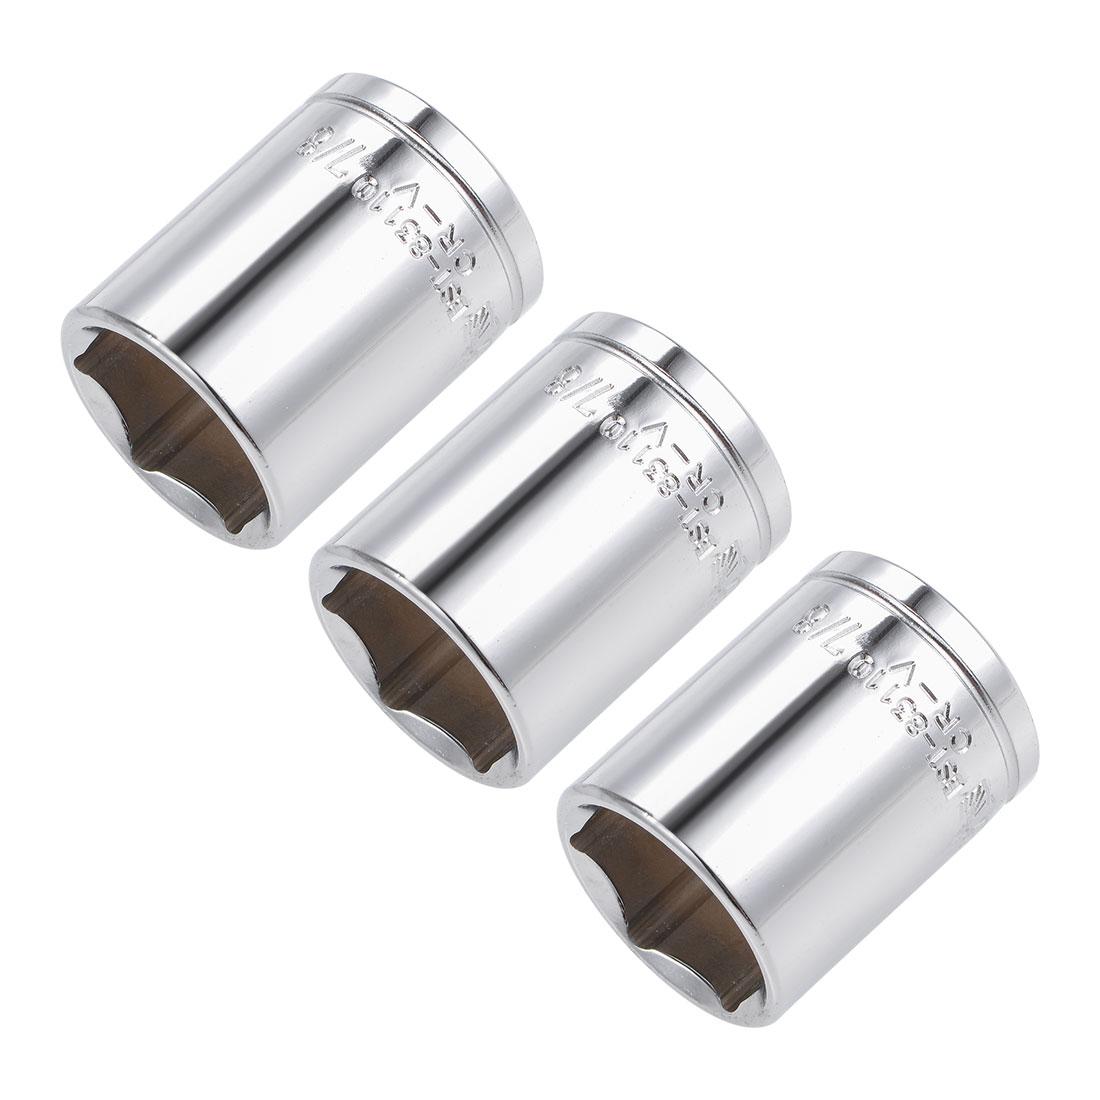 3 Pcs 1/2-inch Drive 7/8-inch 6-Point Shallow Socket, Cr-V